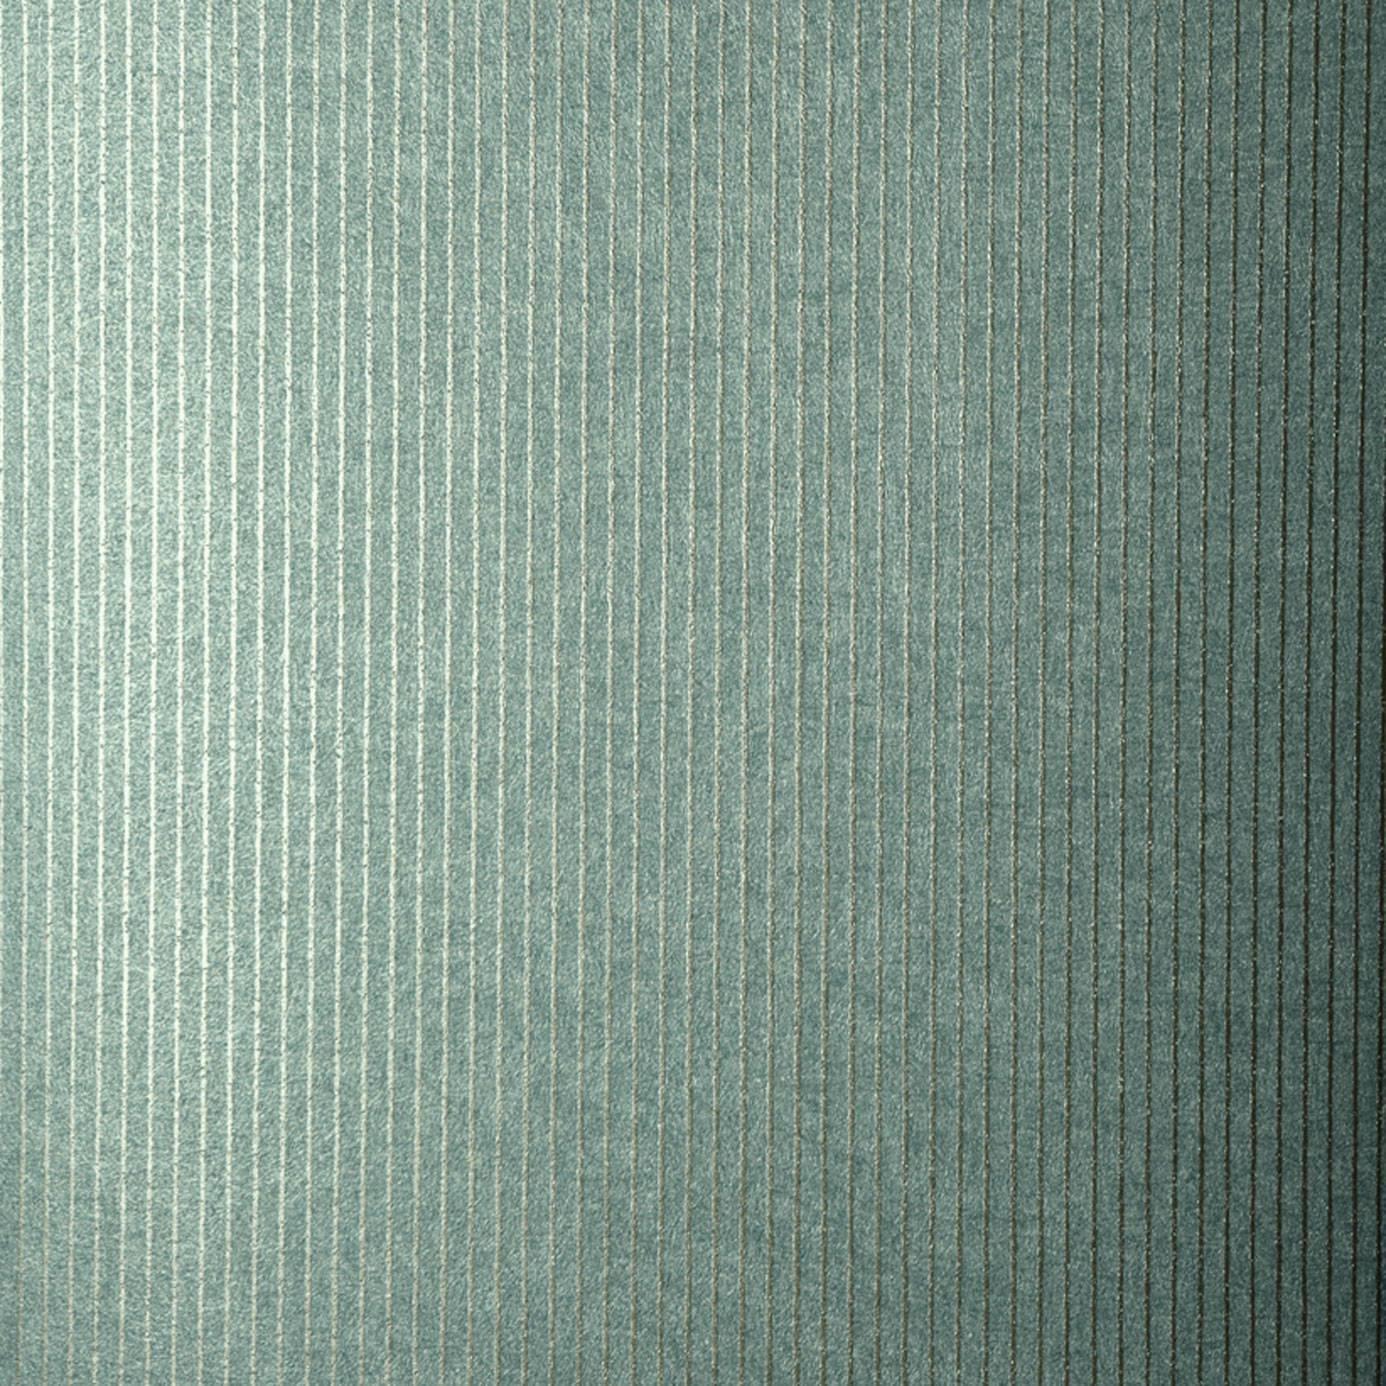 Американские обои Prestigious,  коллекция Elements, артикул1650/593